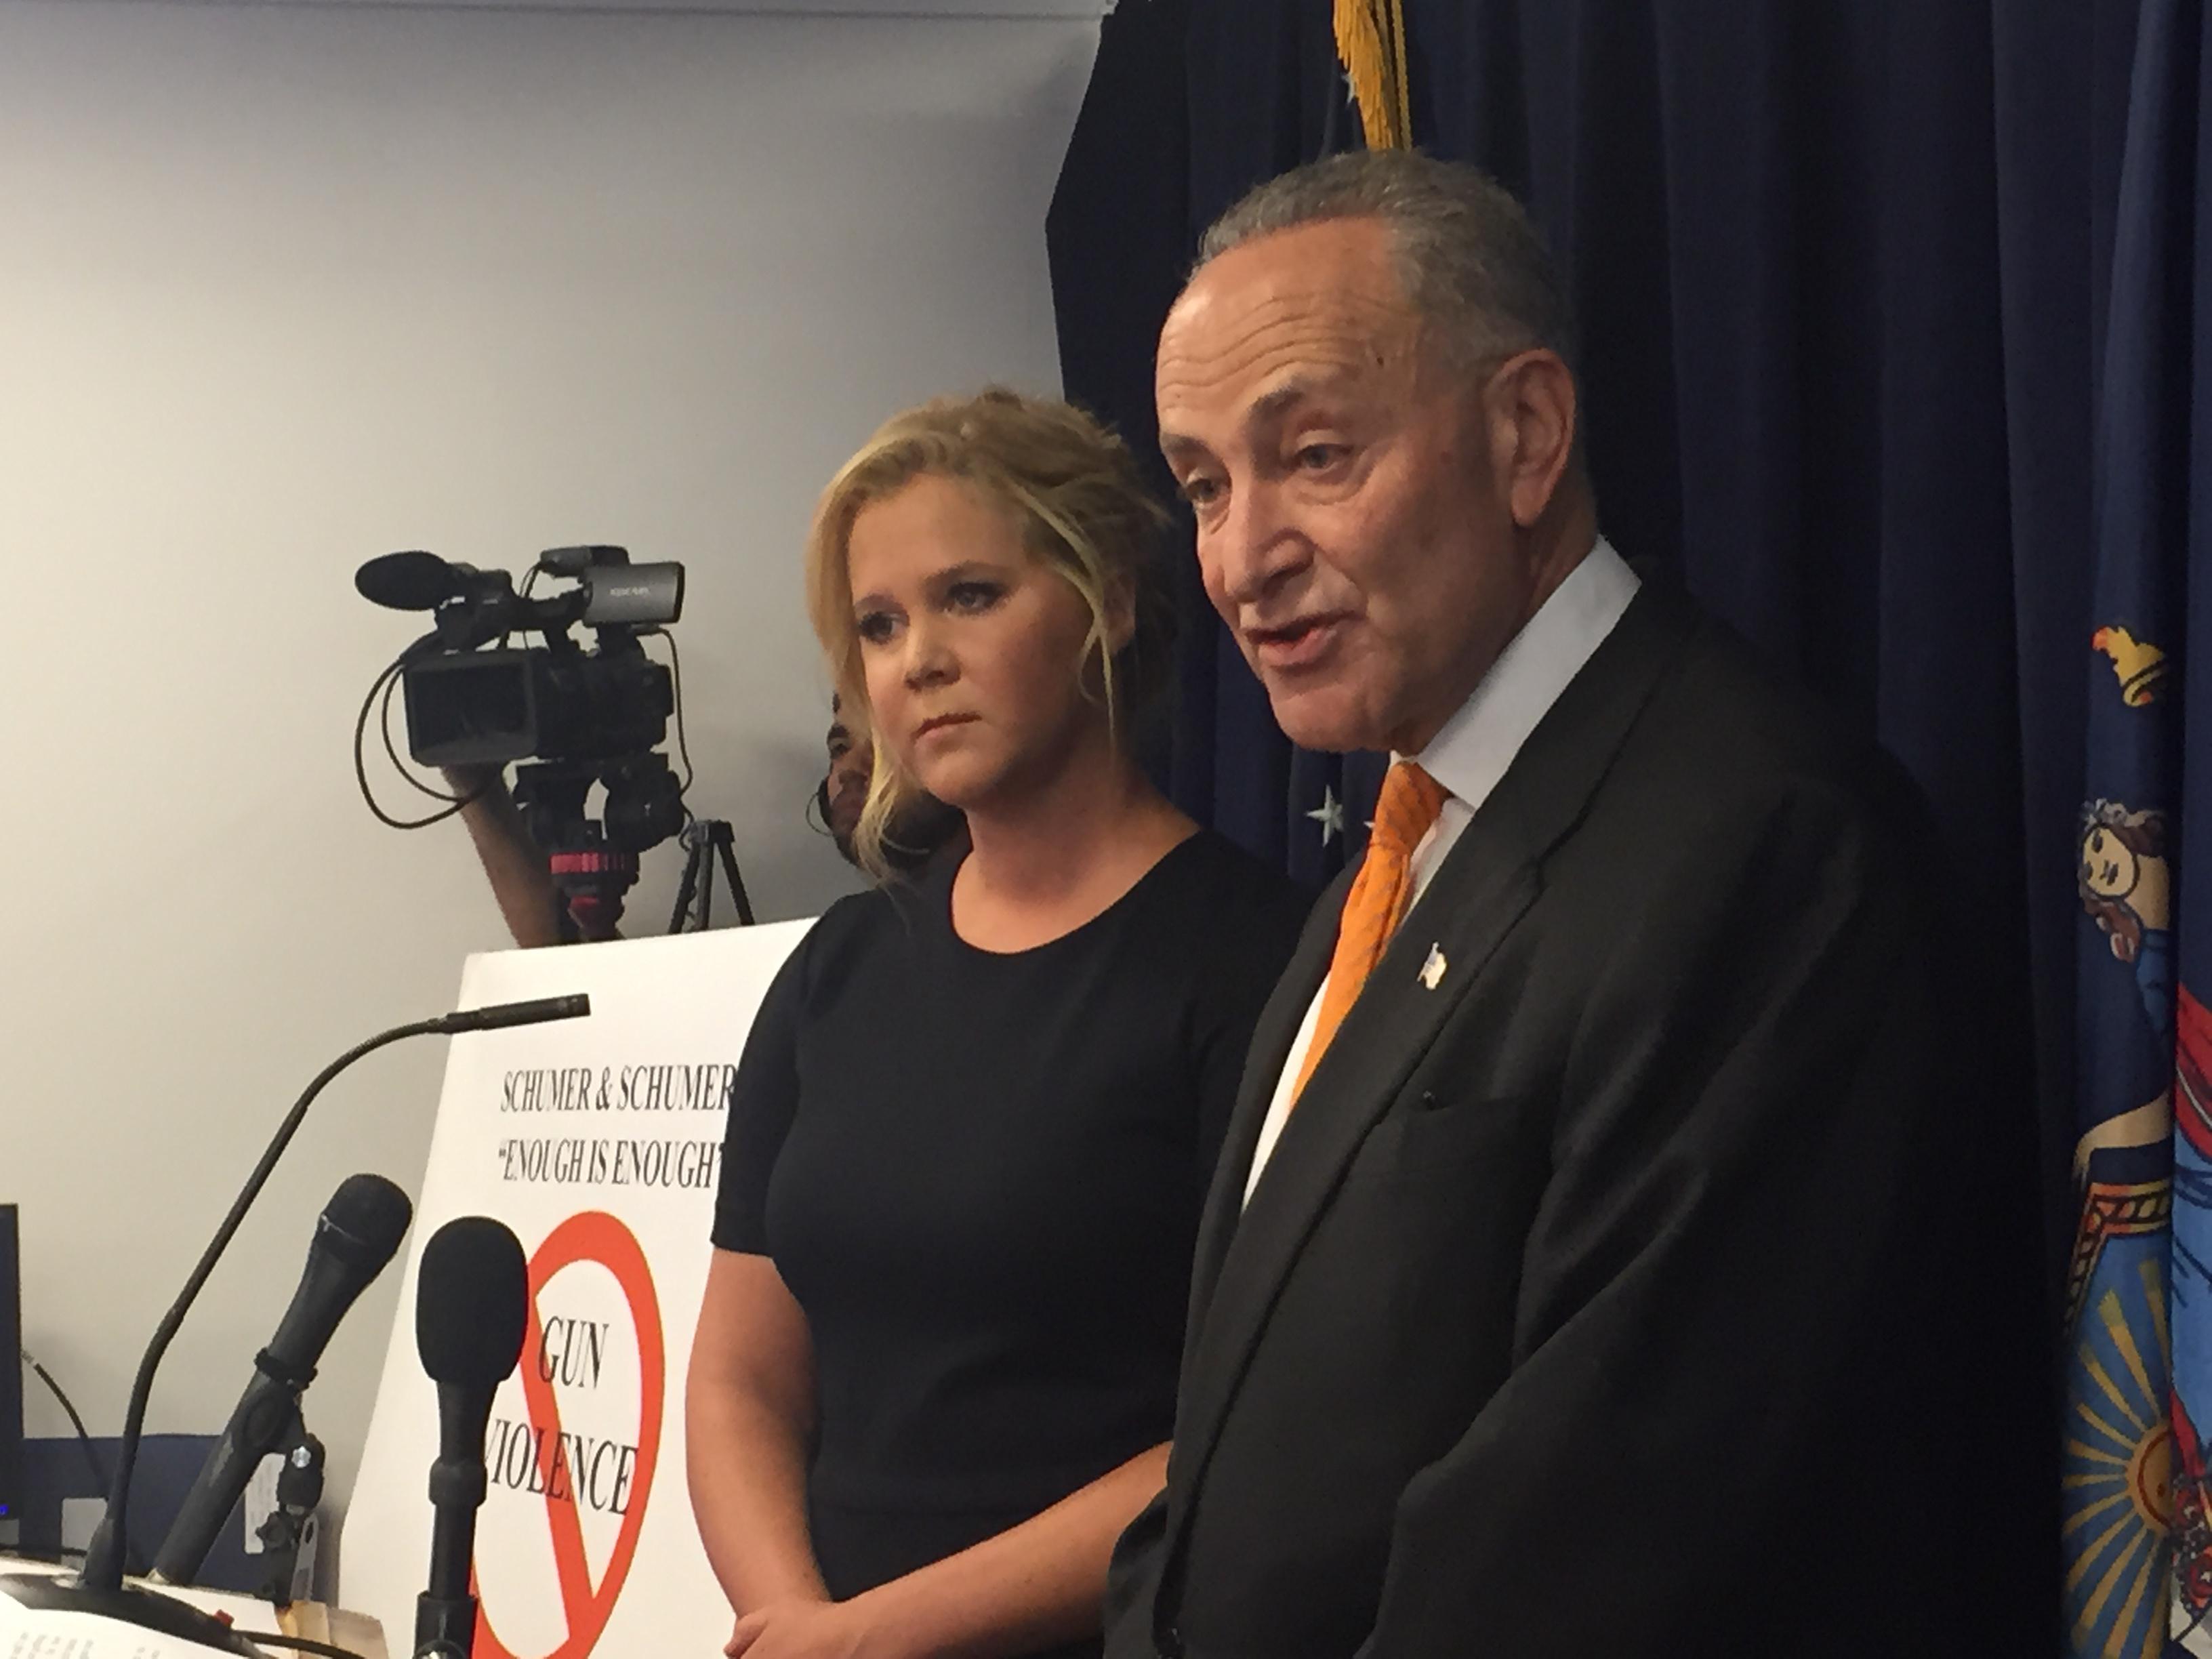 Comedian Amy Schumer and her cousin Sen. Charles Schumer discuss gun control legislation. (Photo: Jillian Jorgensen for Observer)